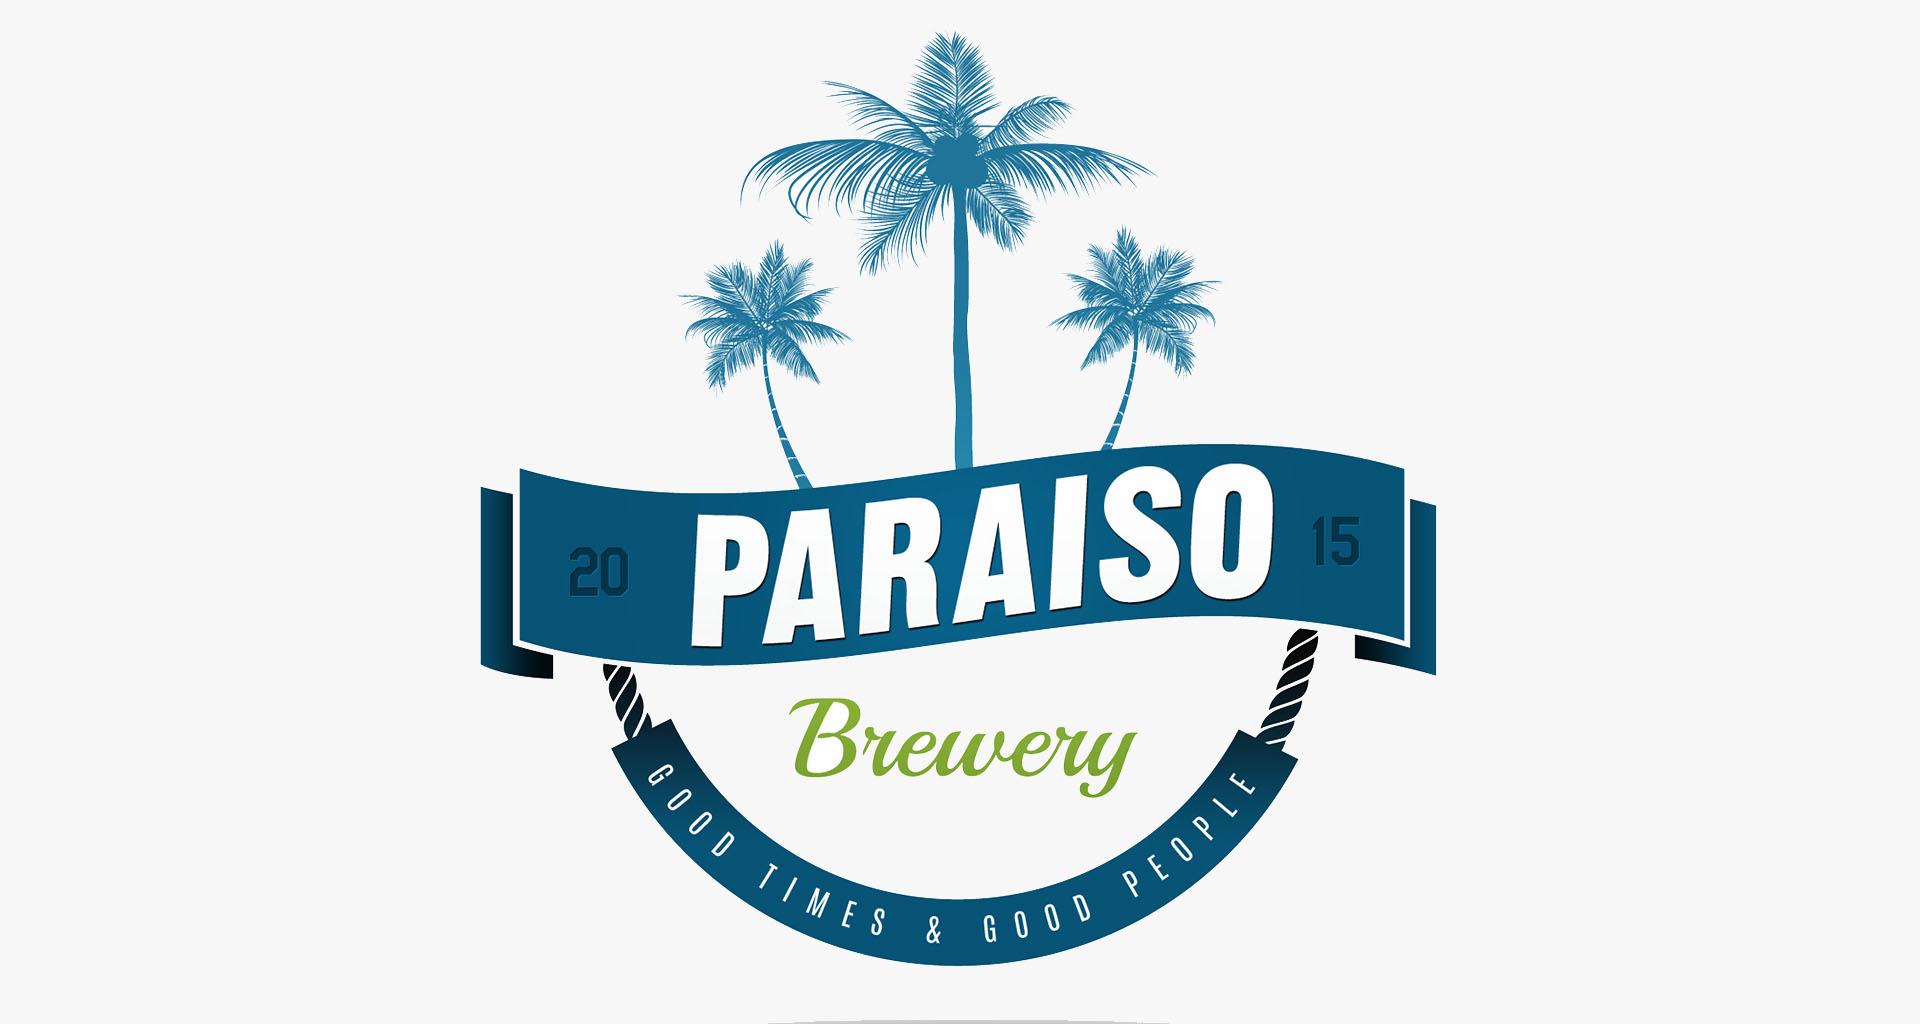 Paraiso1920.jpg